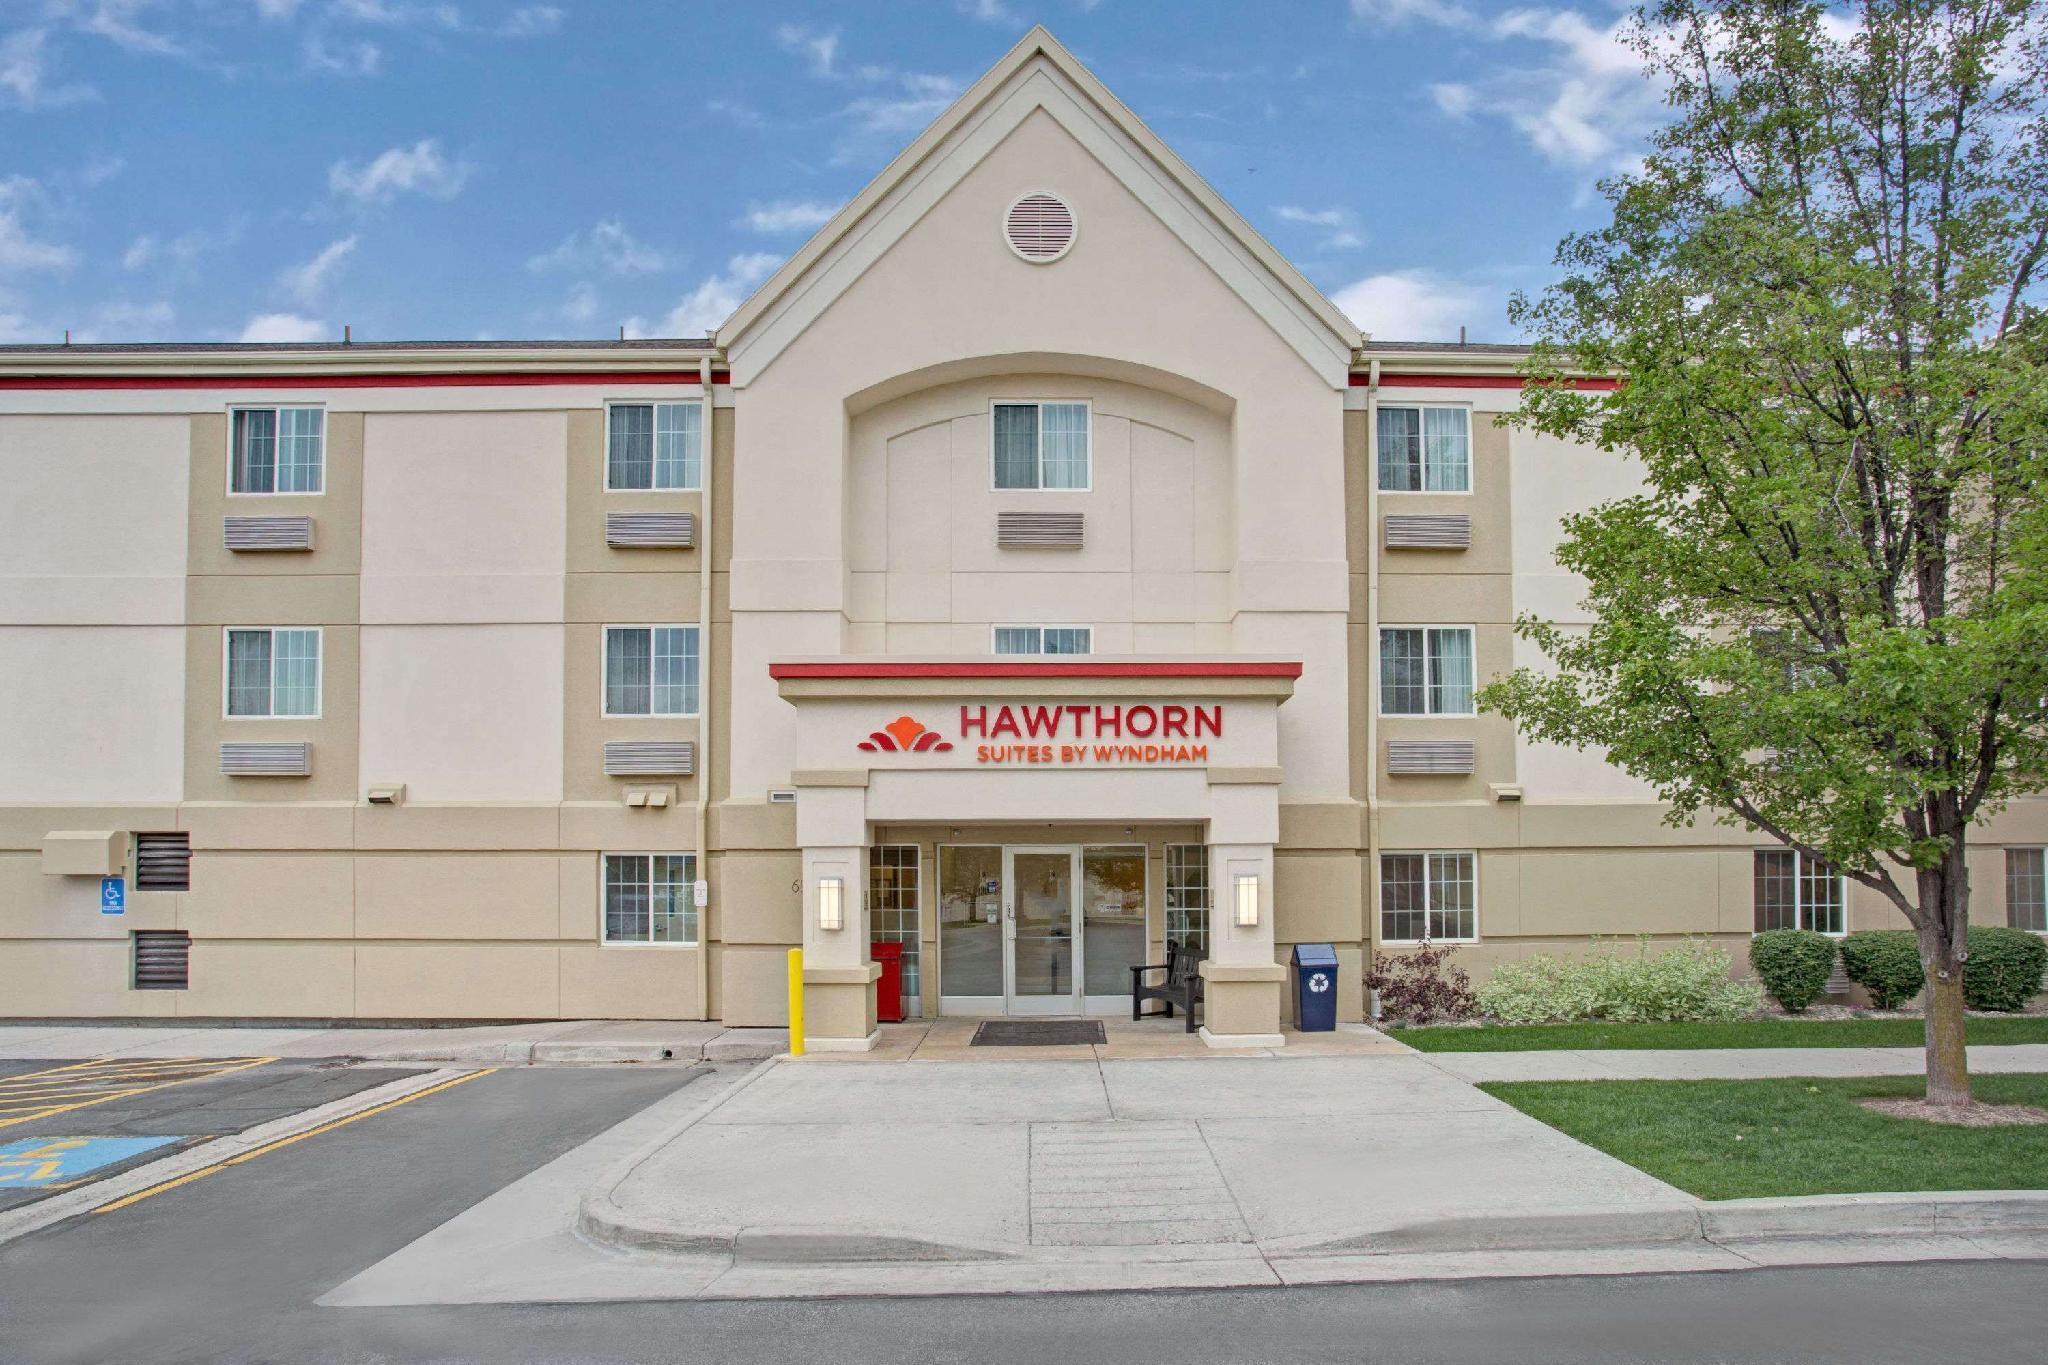 Hawthorn Suites By Wyndham Salt Lake City Fort Union